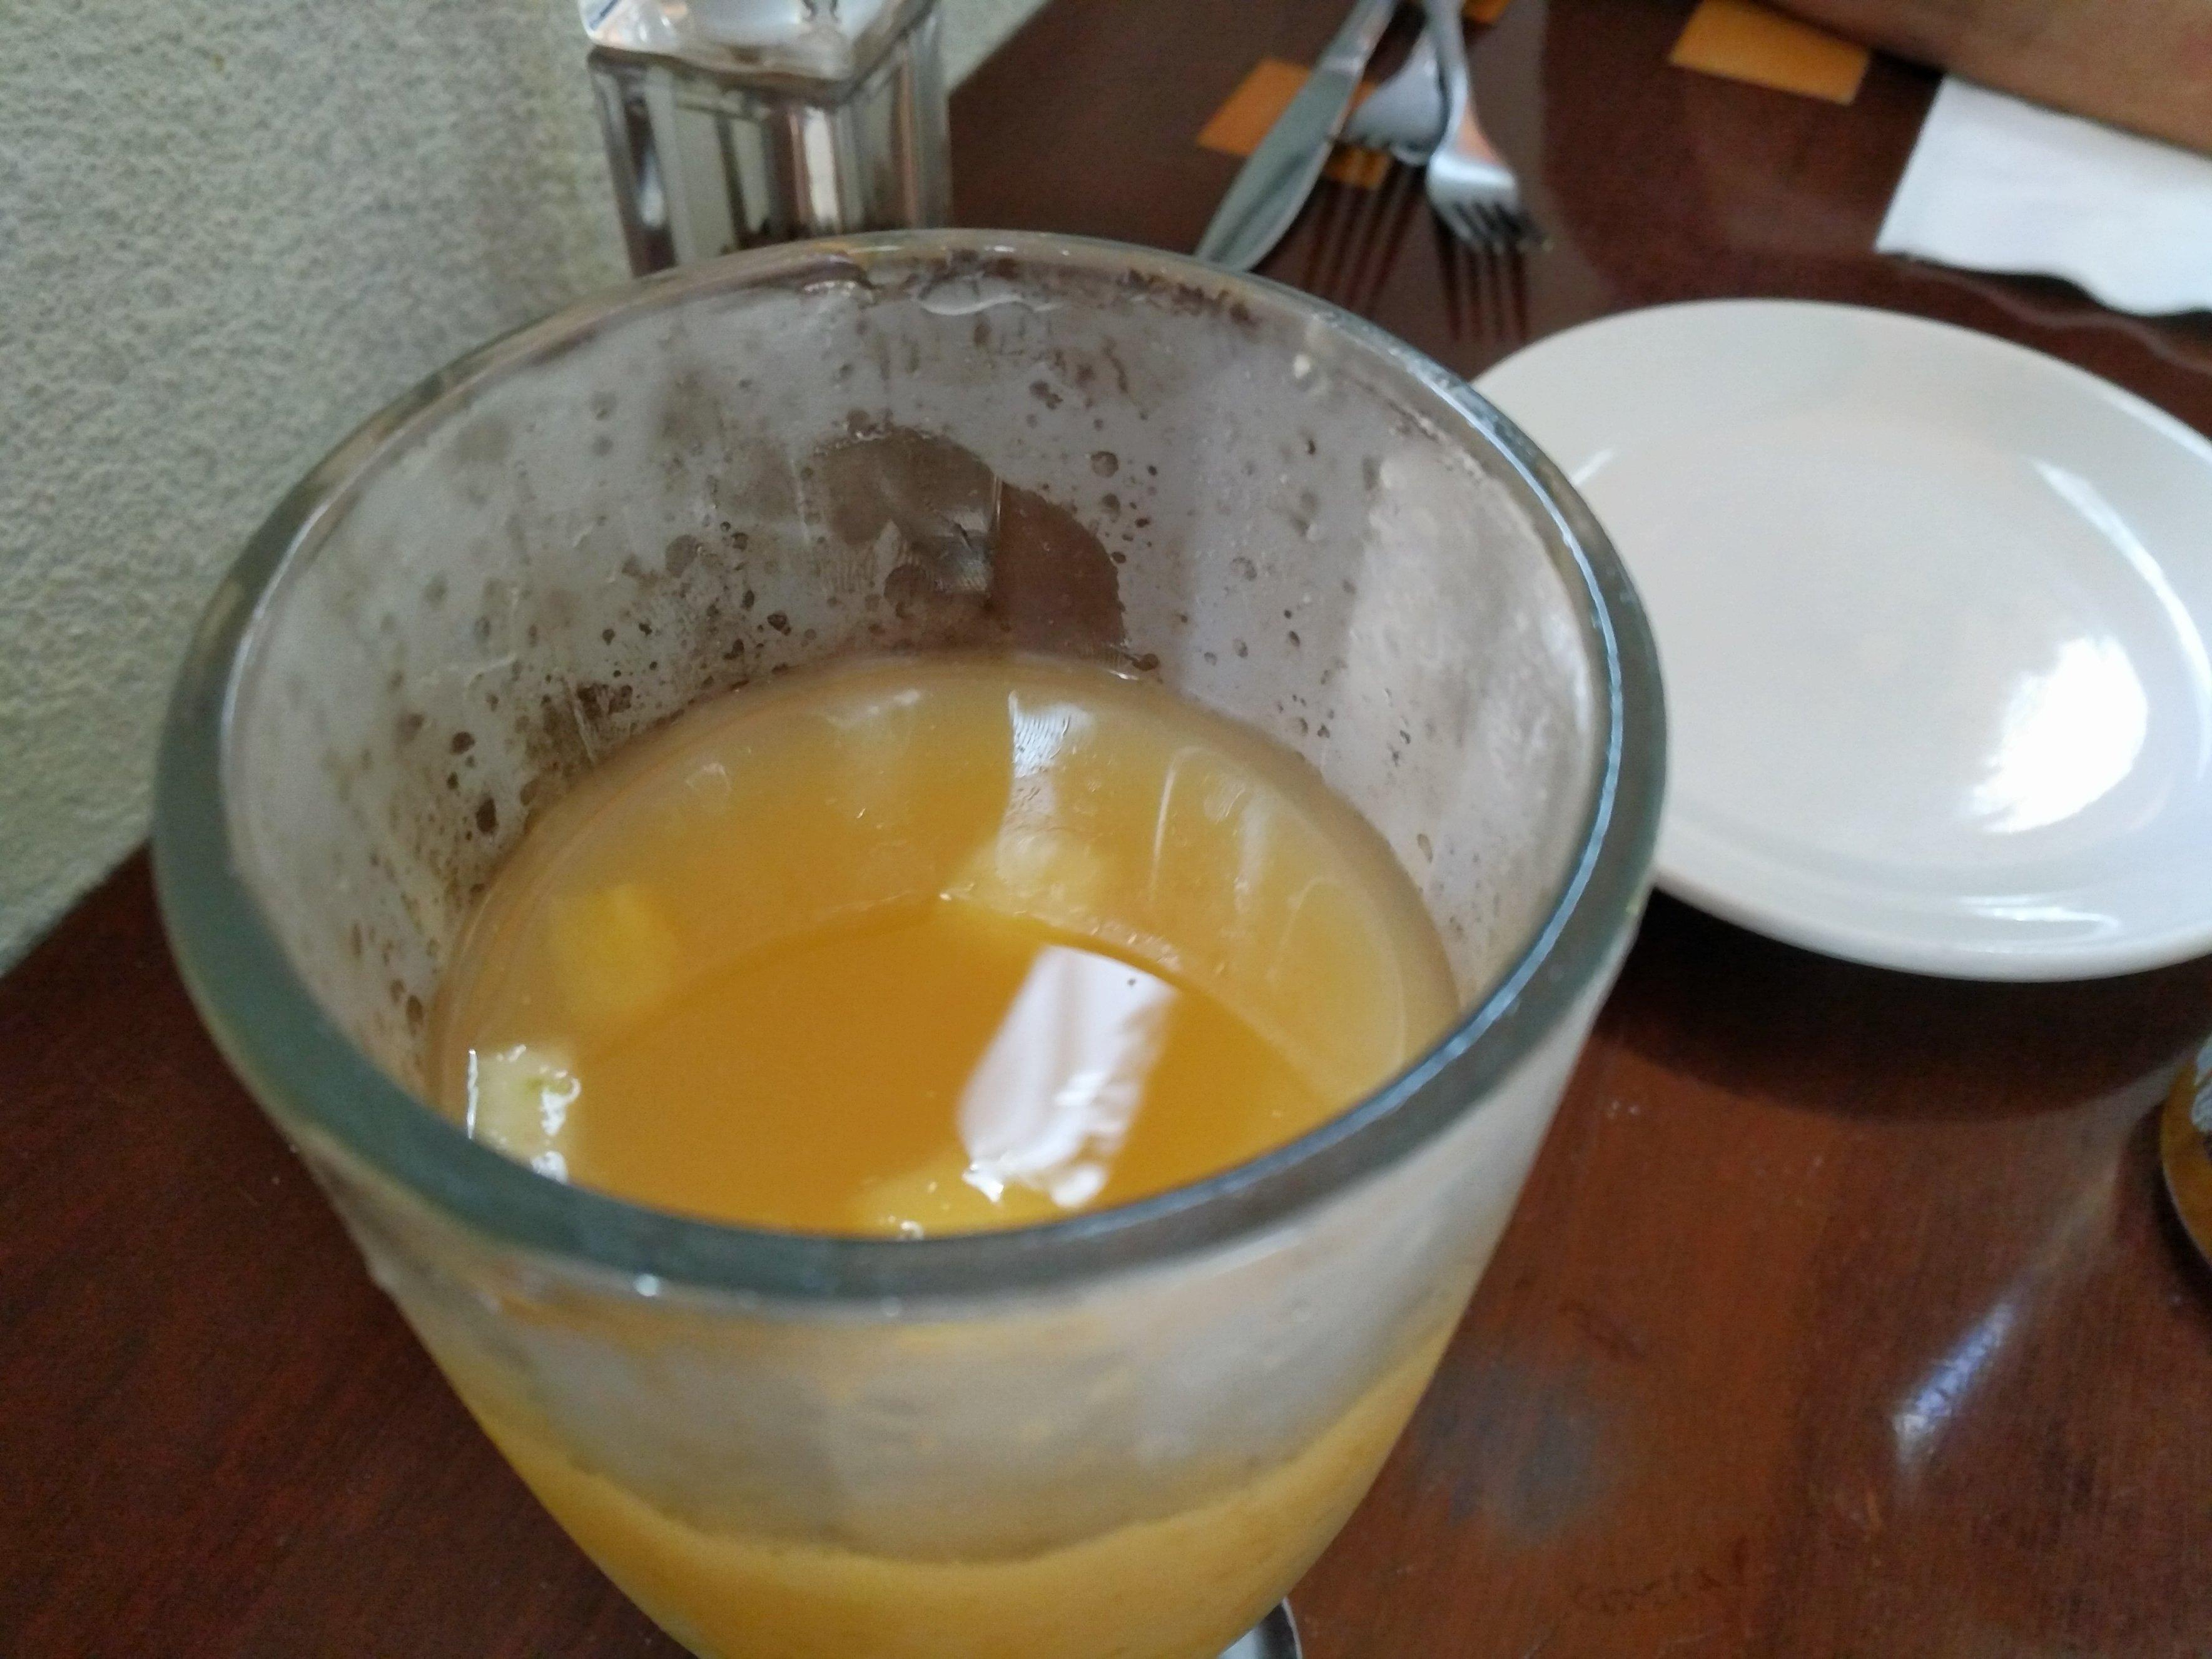 The+sweet+maracuya+juice+tantalizes+the+taste+buds.